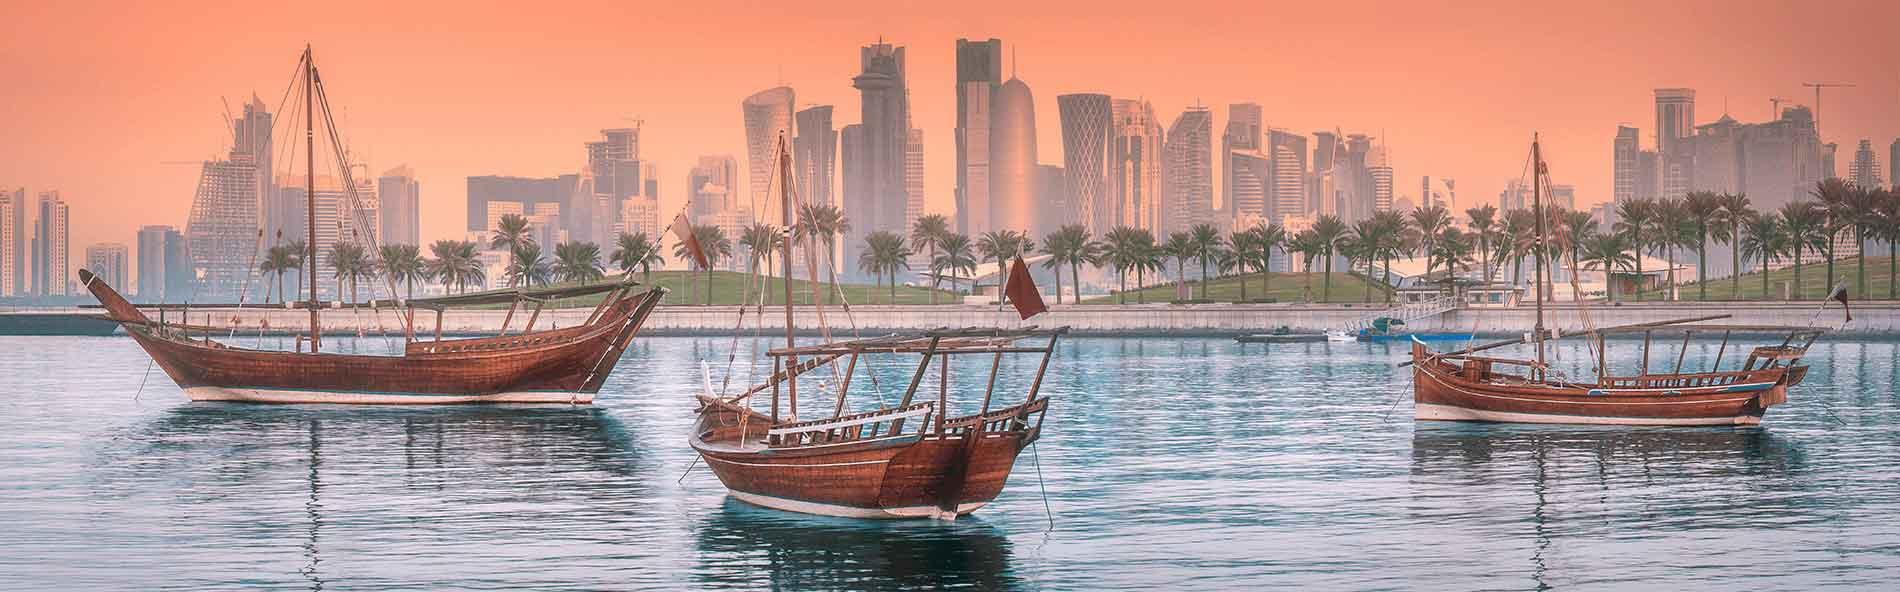 Yacht & Boat Adventures